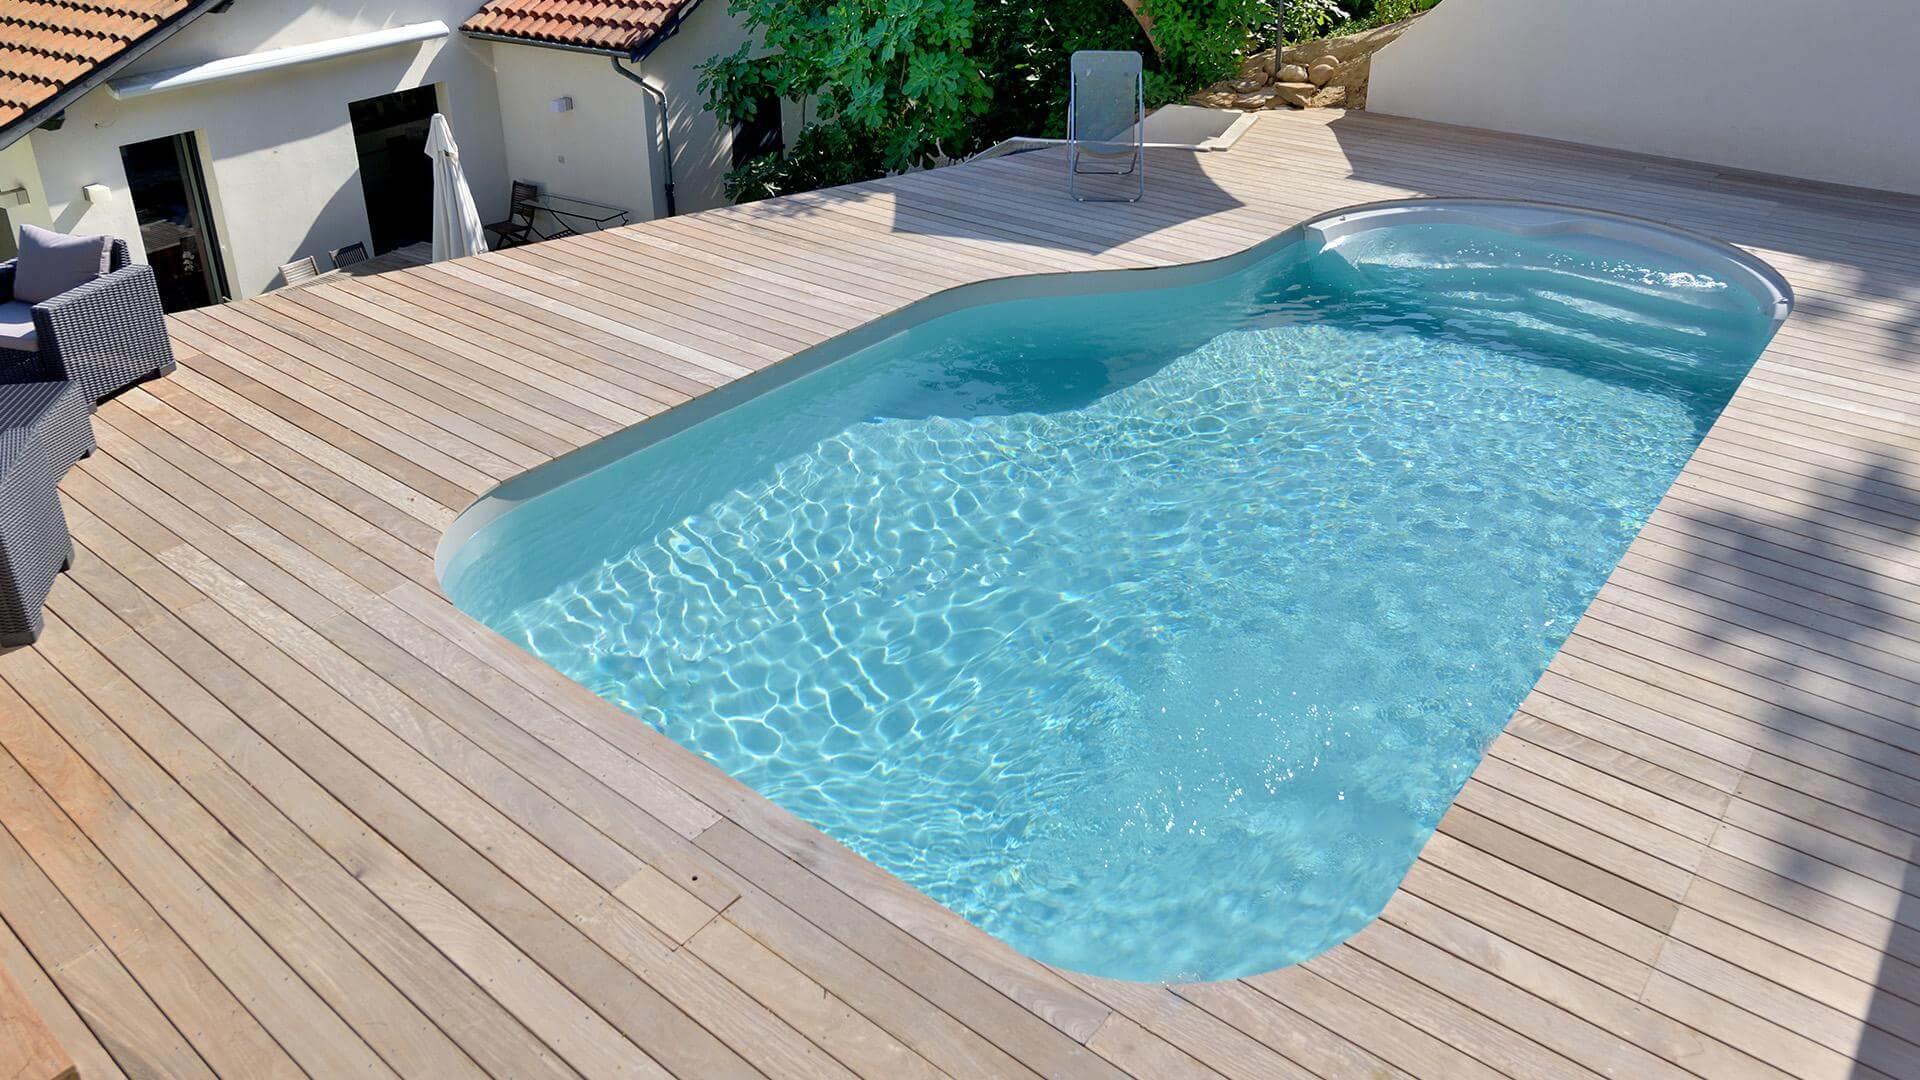 Pool Cléa – fließendes Design in freien Formen   Waterair ...